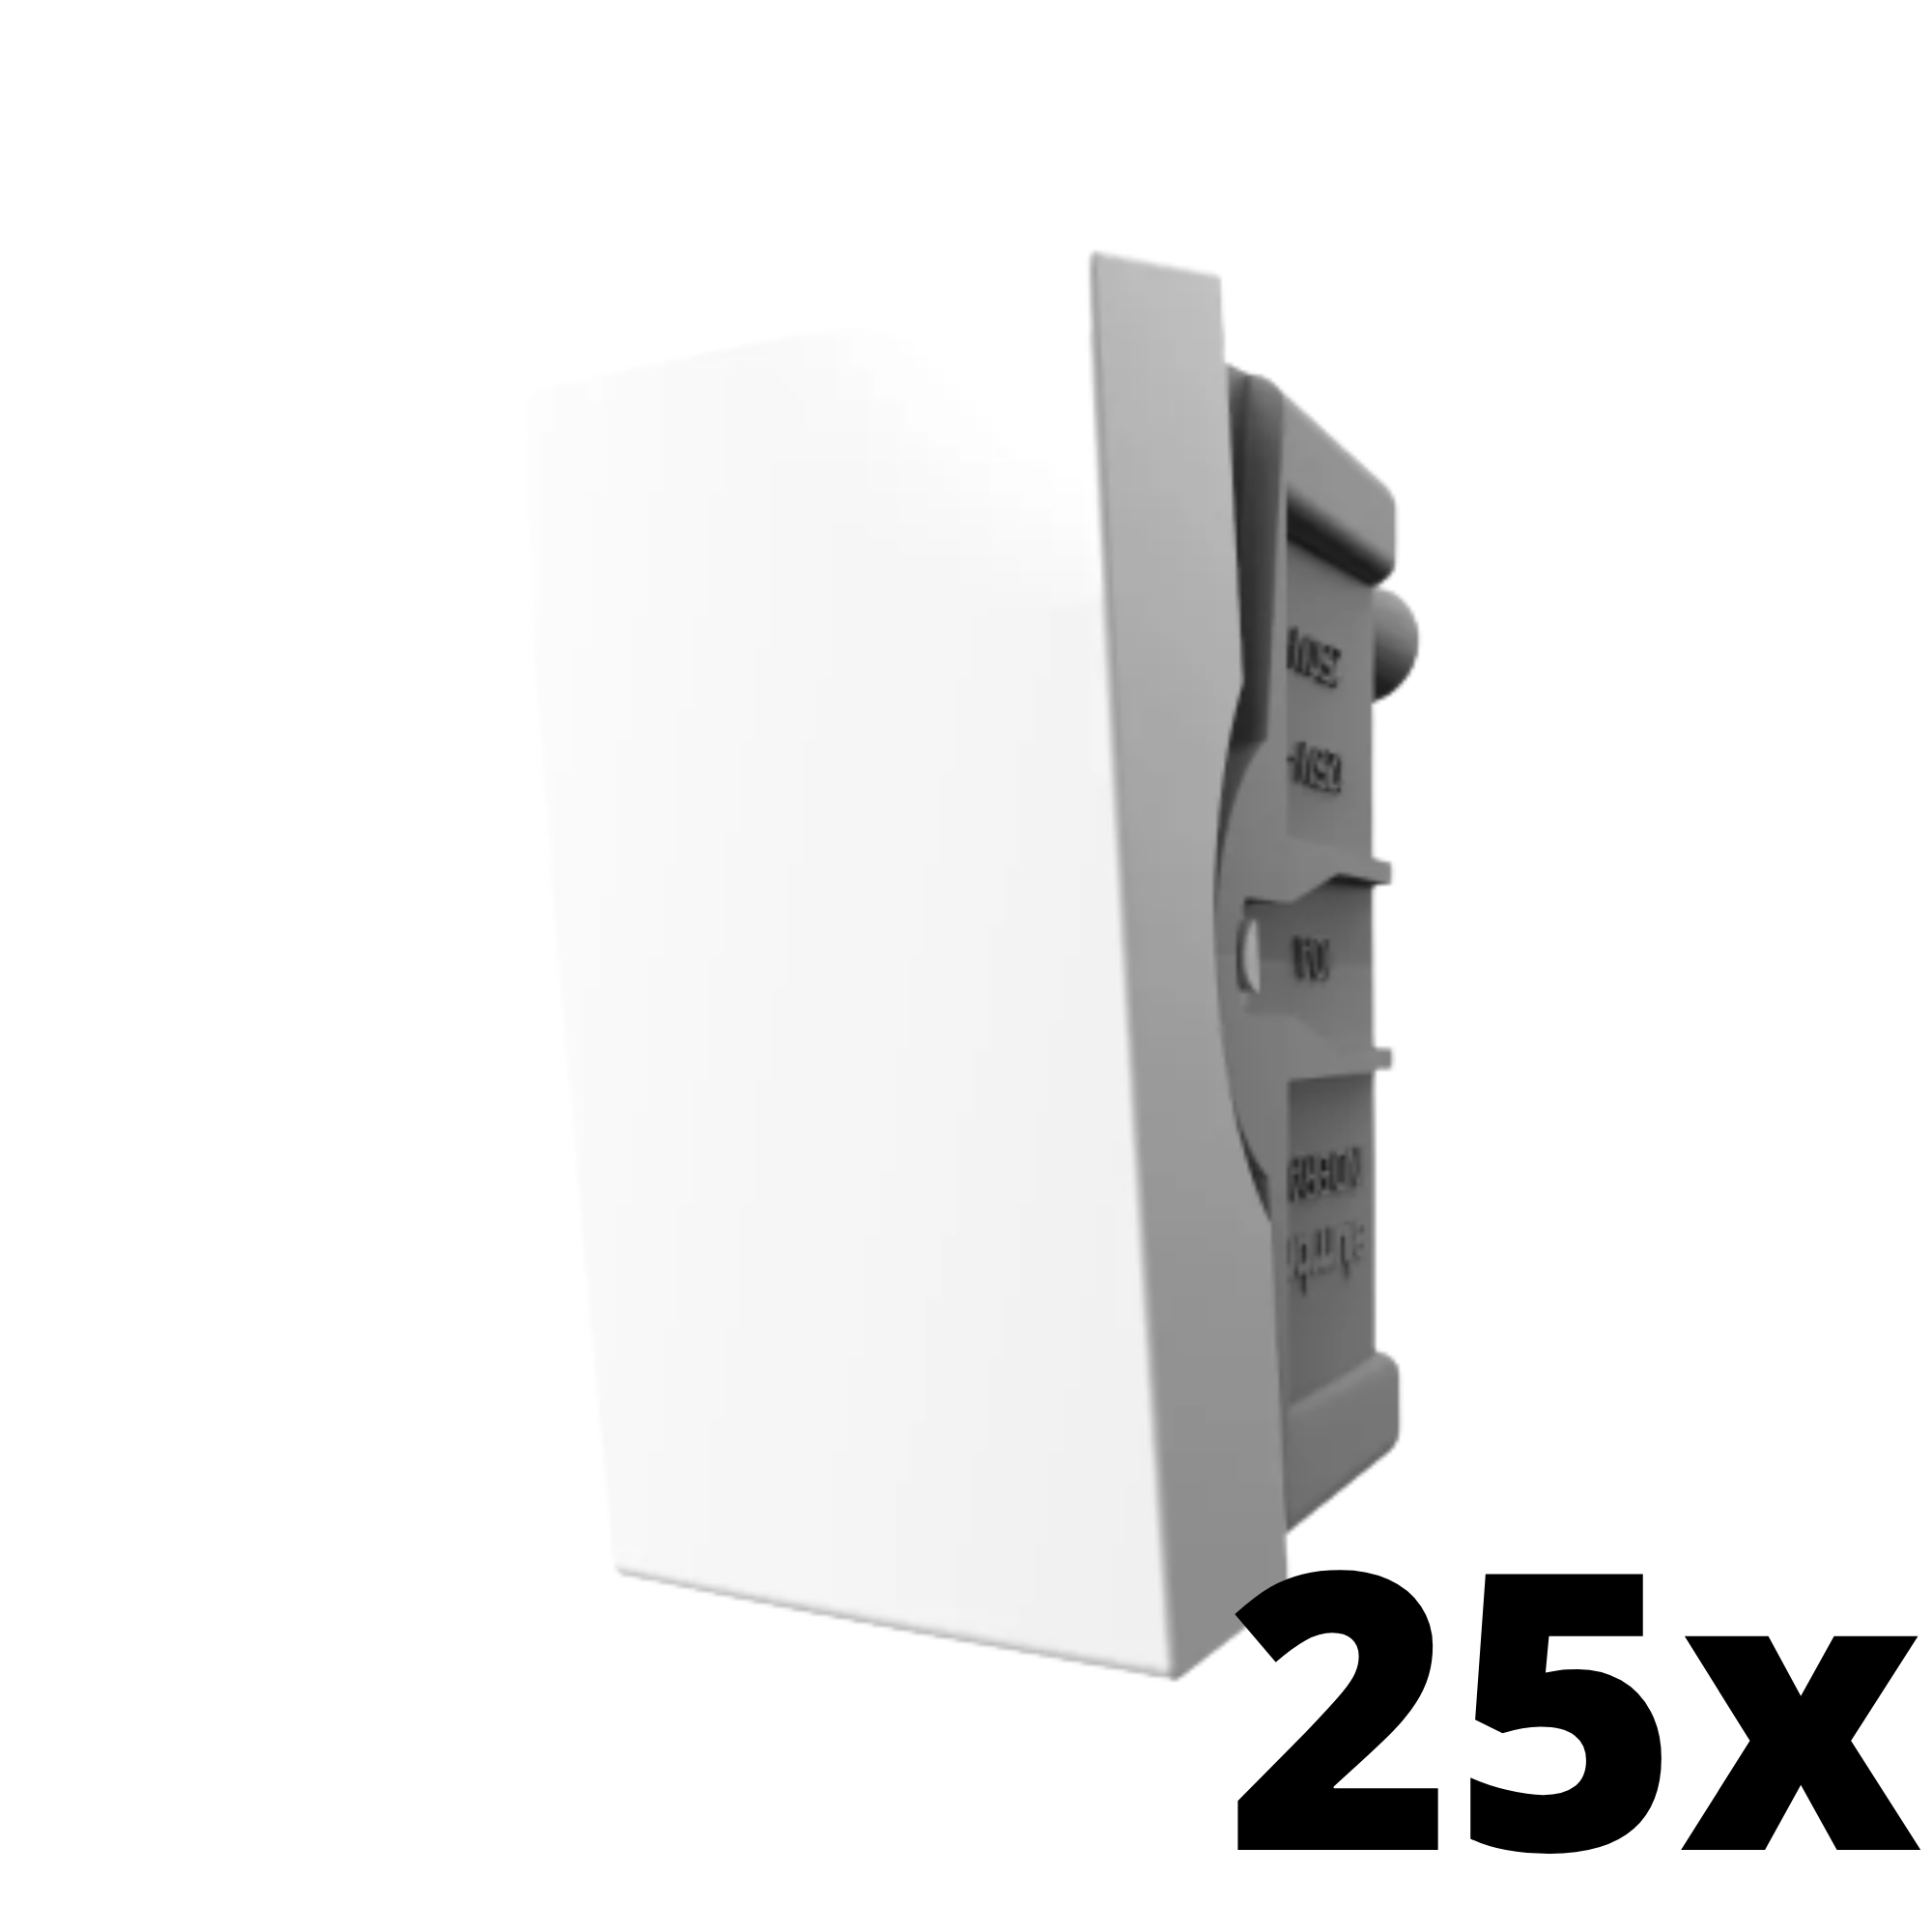 Kit 25 Inova Pró Módulo de Interruptor Intermediário